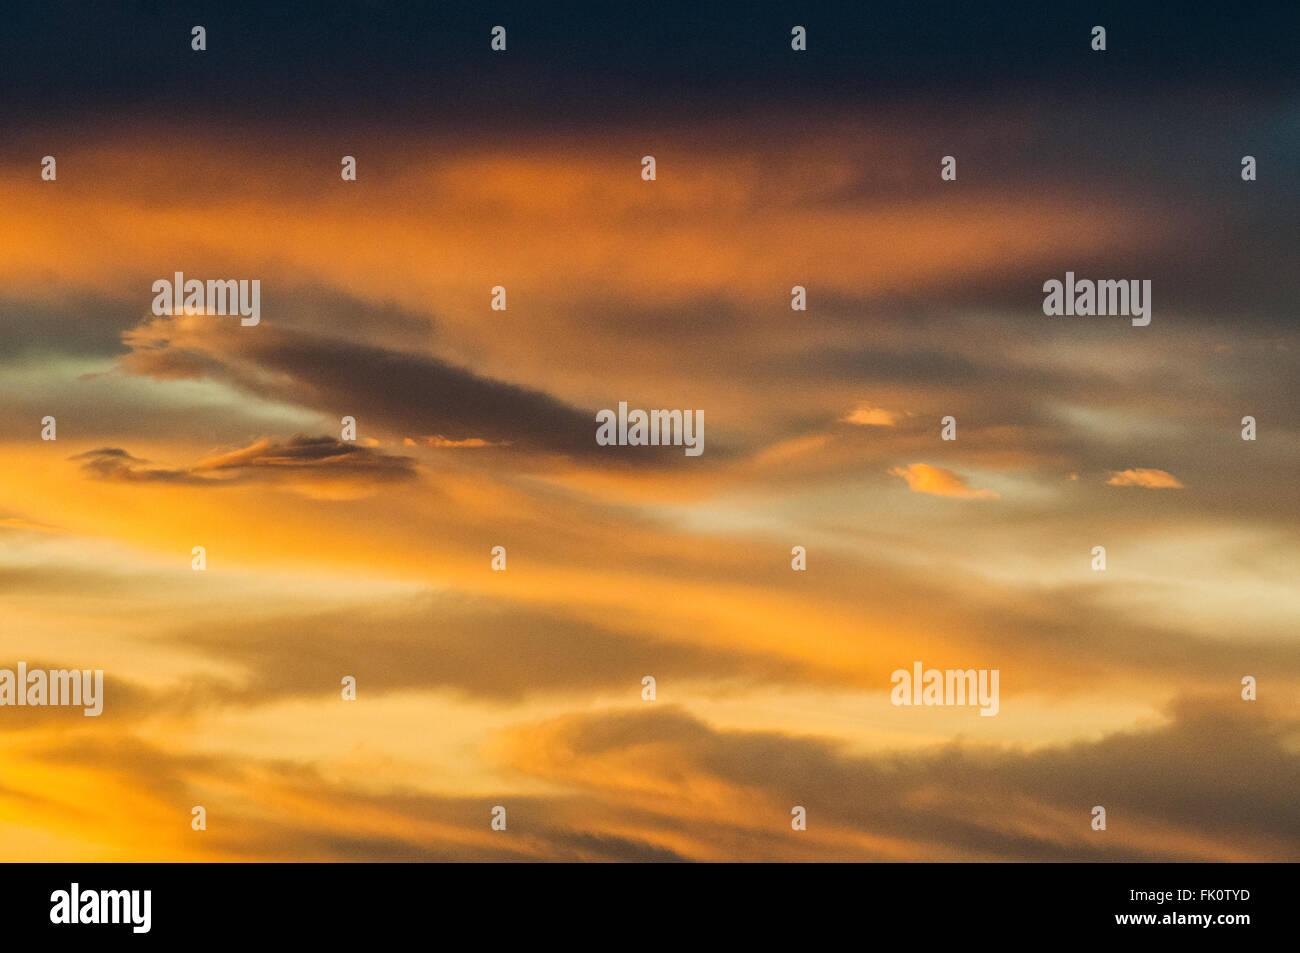 Stratus clouds illuminated by the setting sun. Othello, Washington, United States. Stock Photo